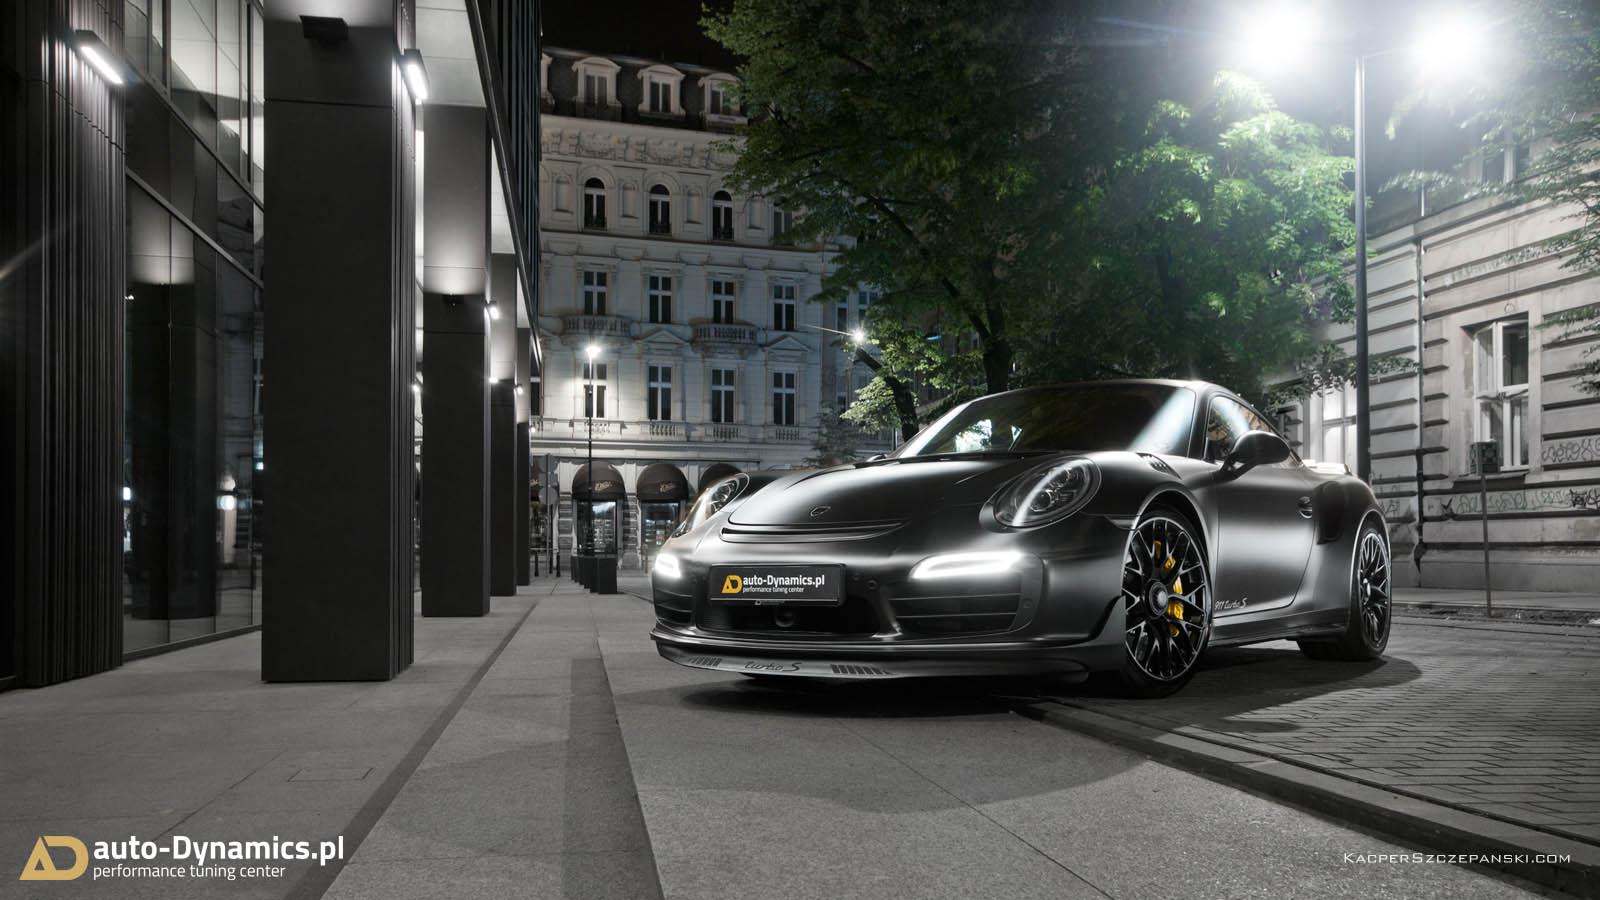 Porsche 911 Turbo S by Auto-Dynamics (9)